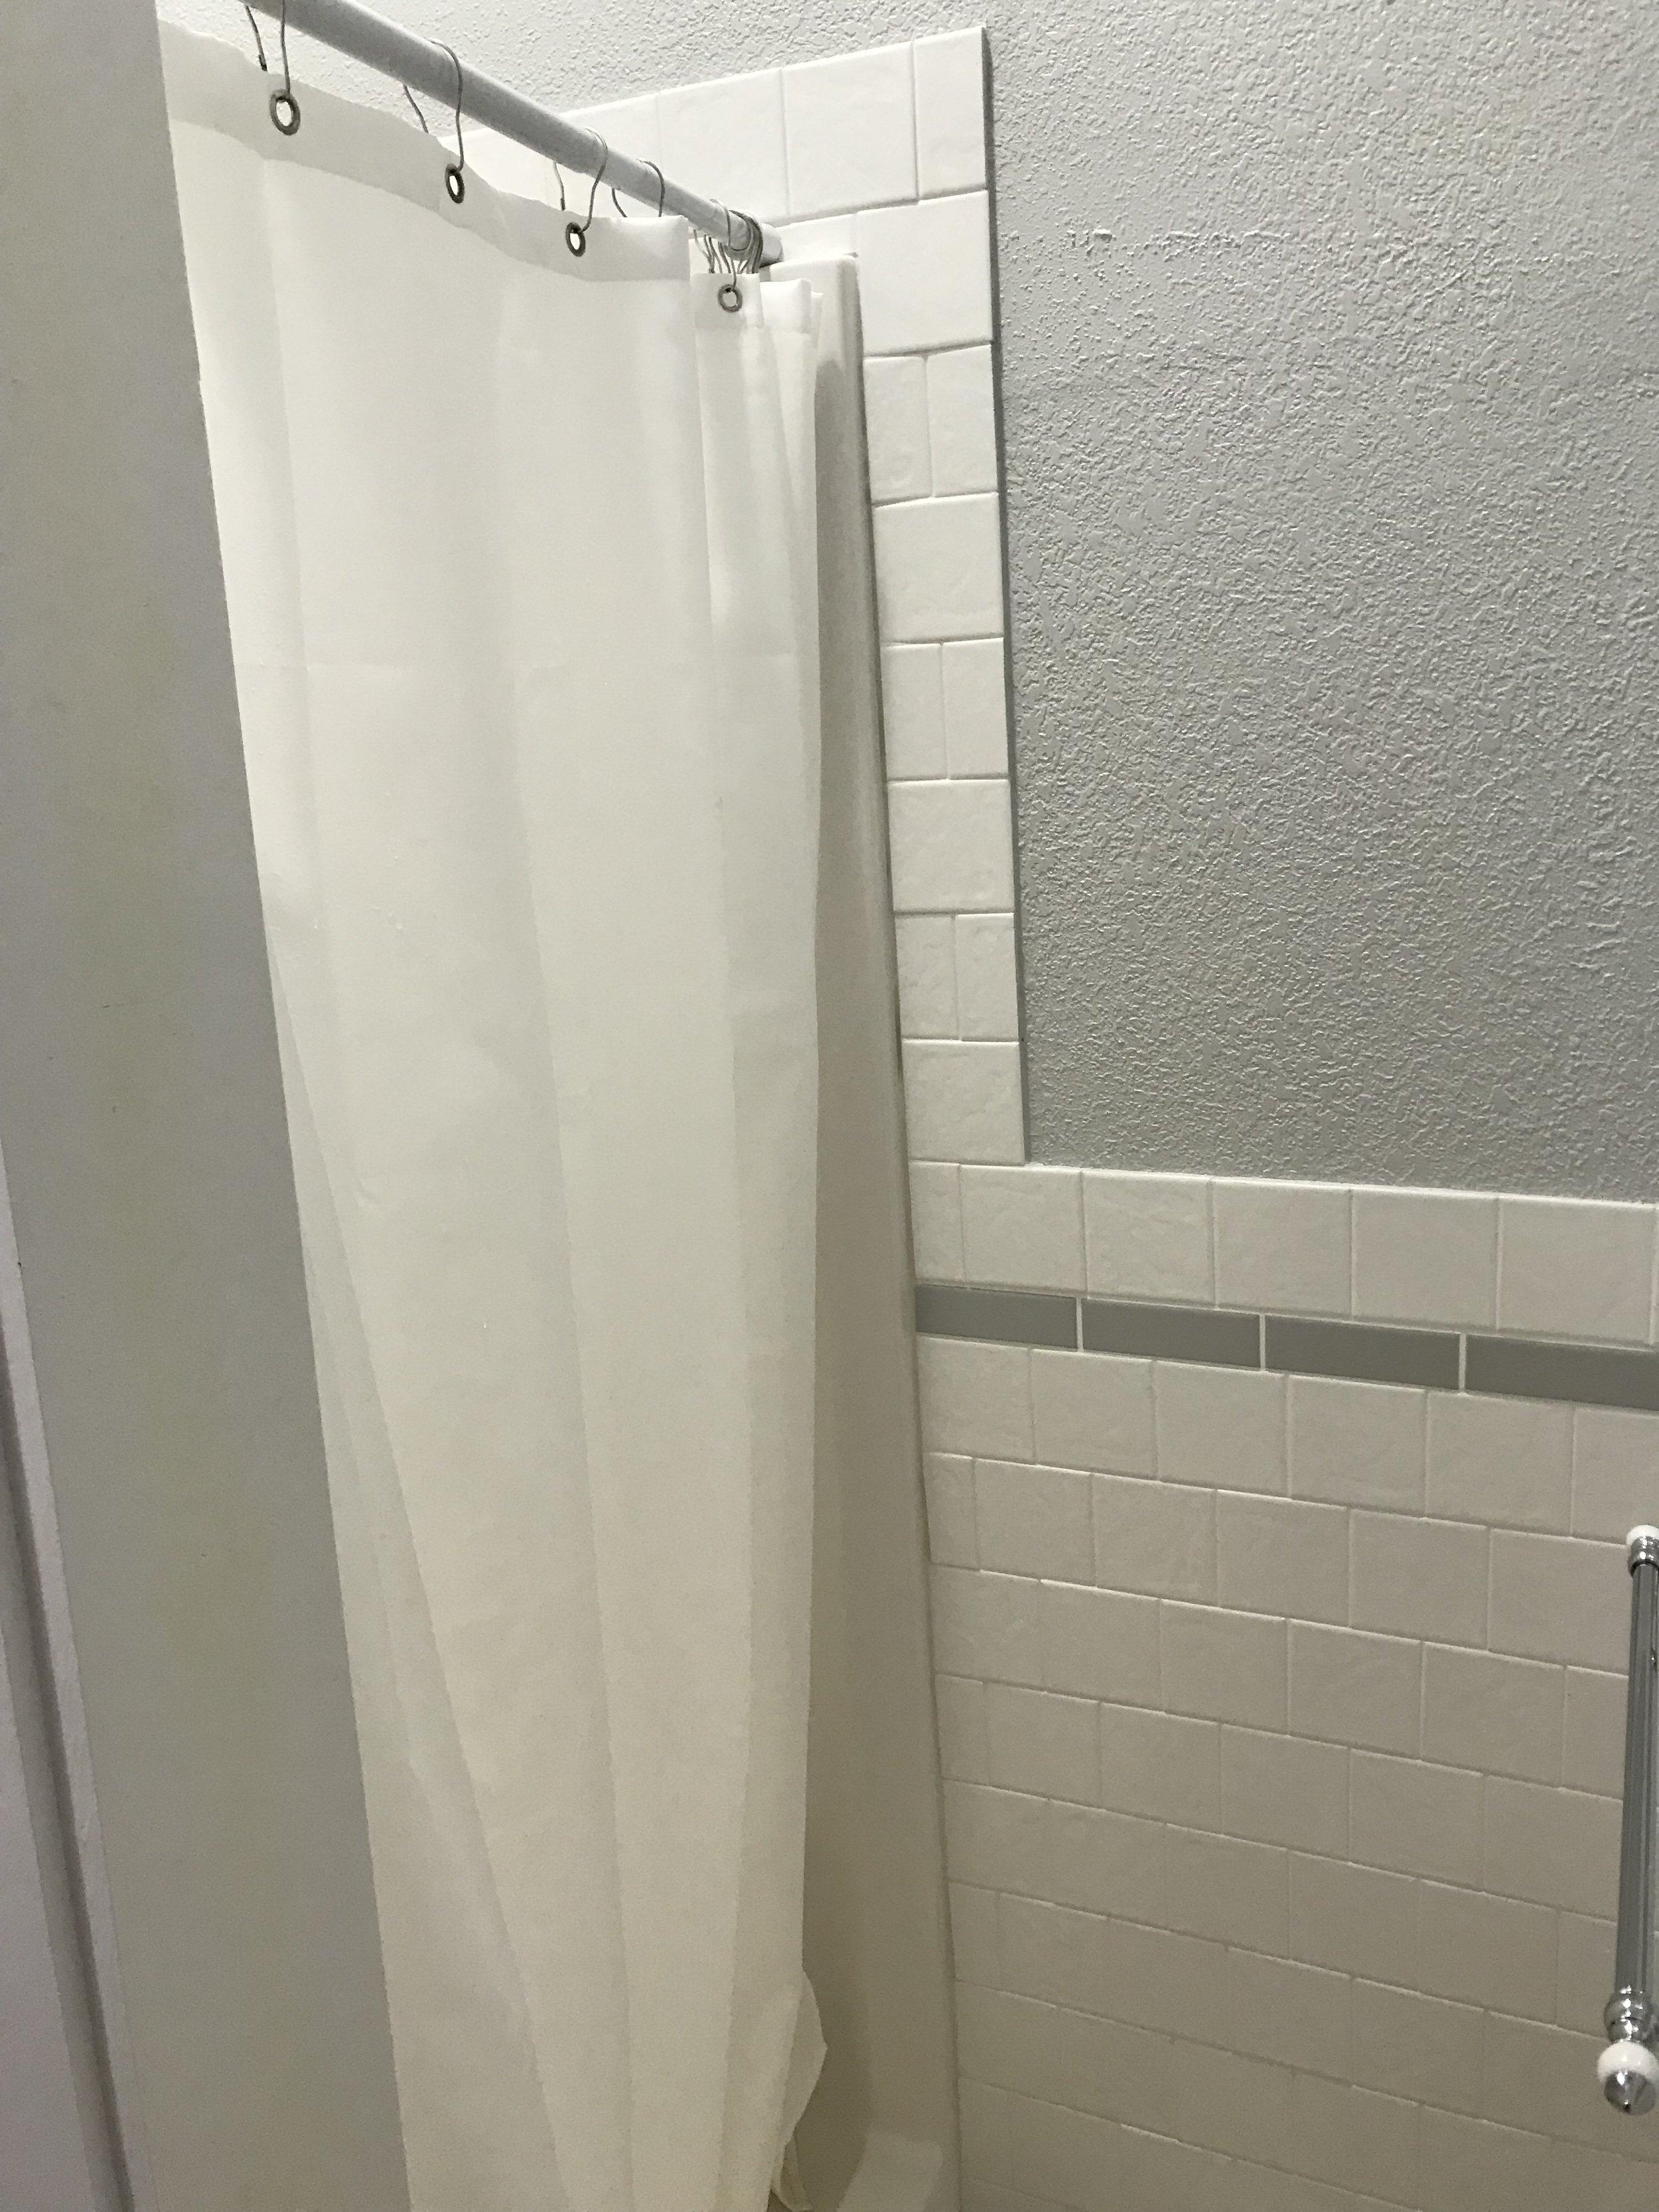 One piece shower unit